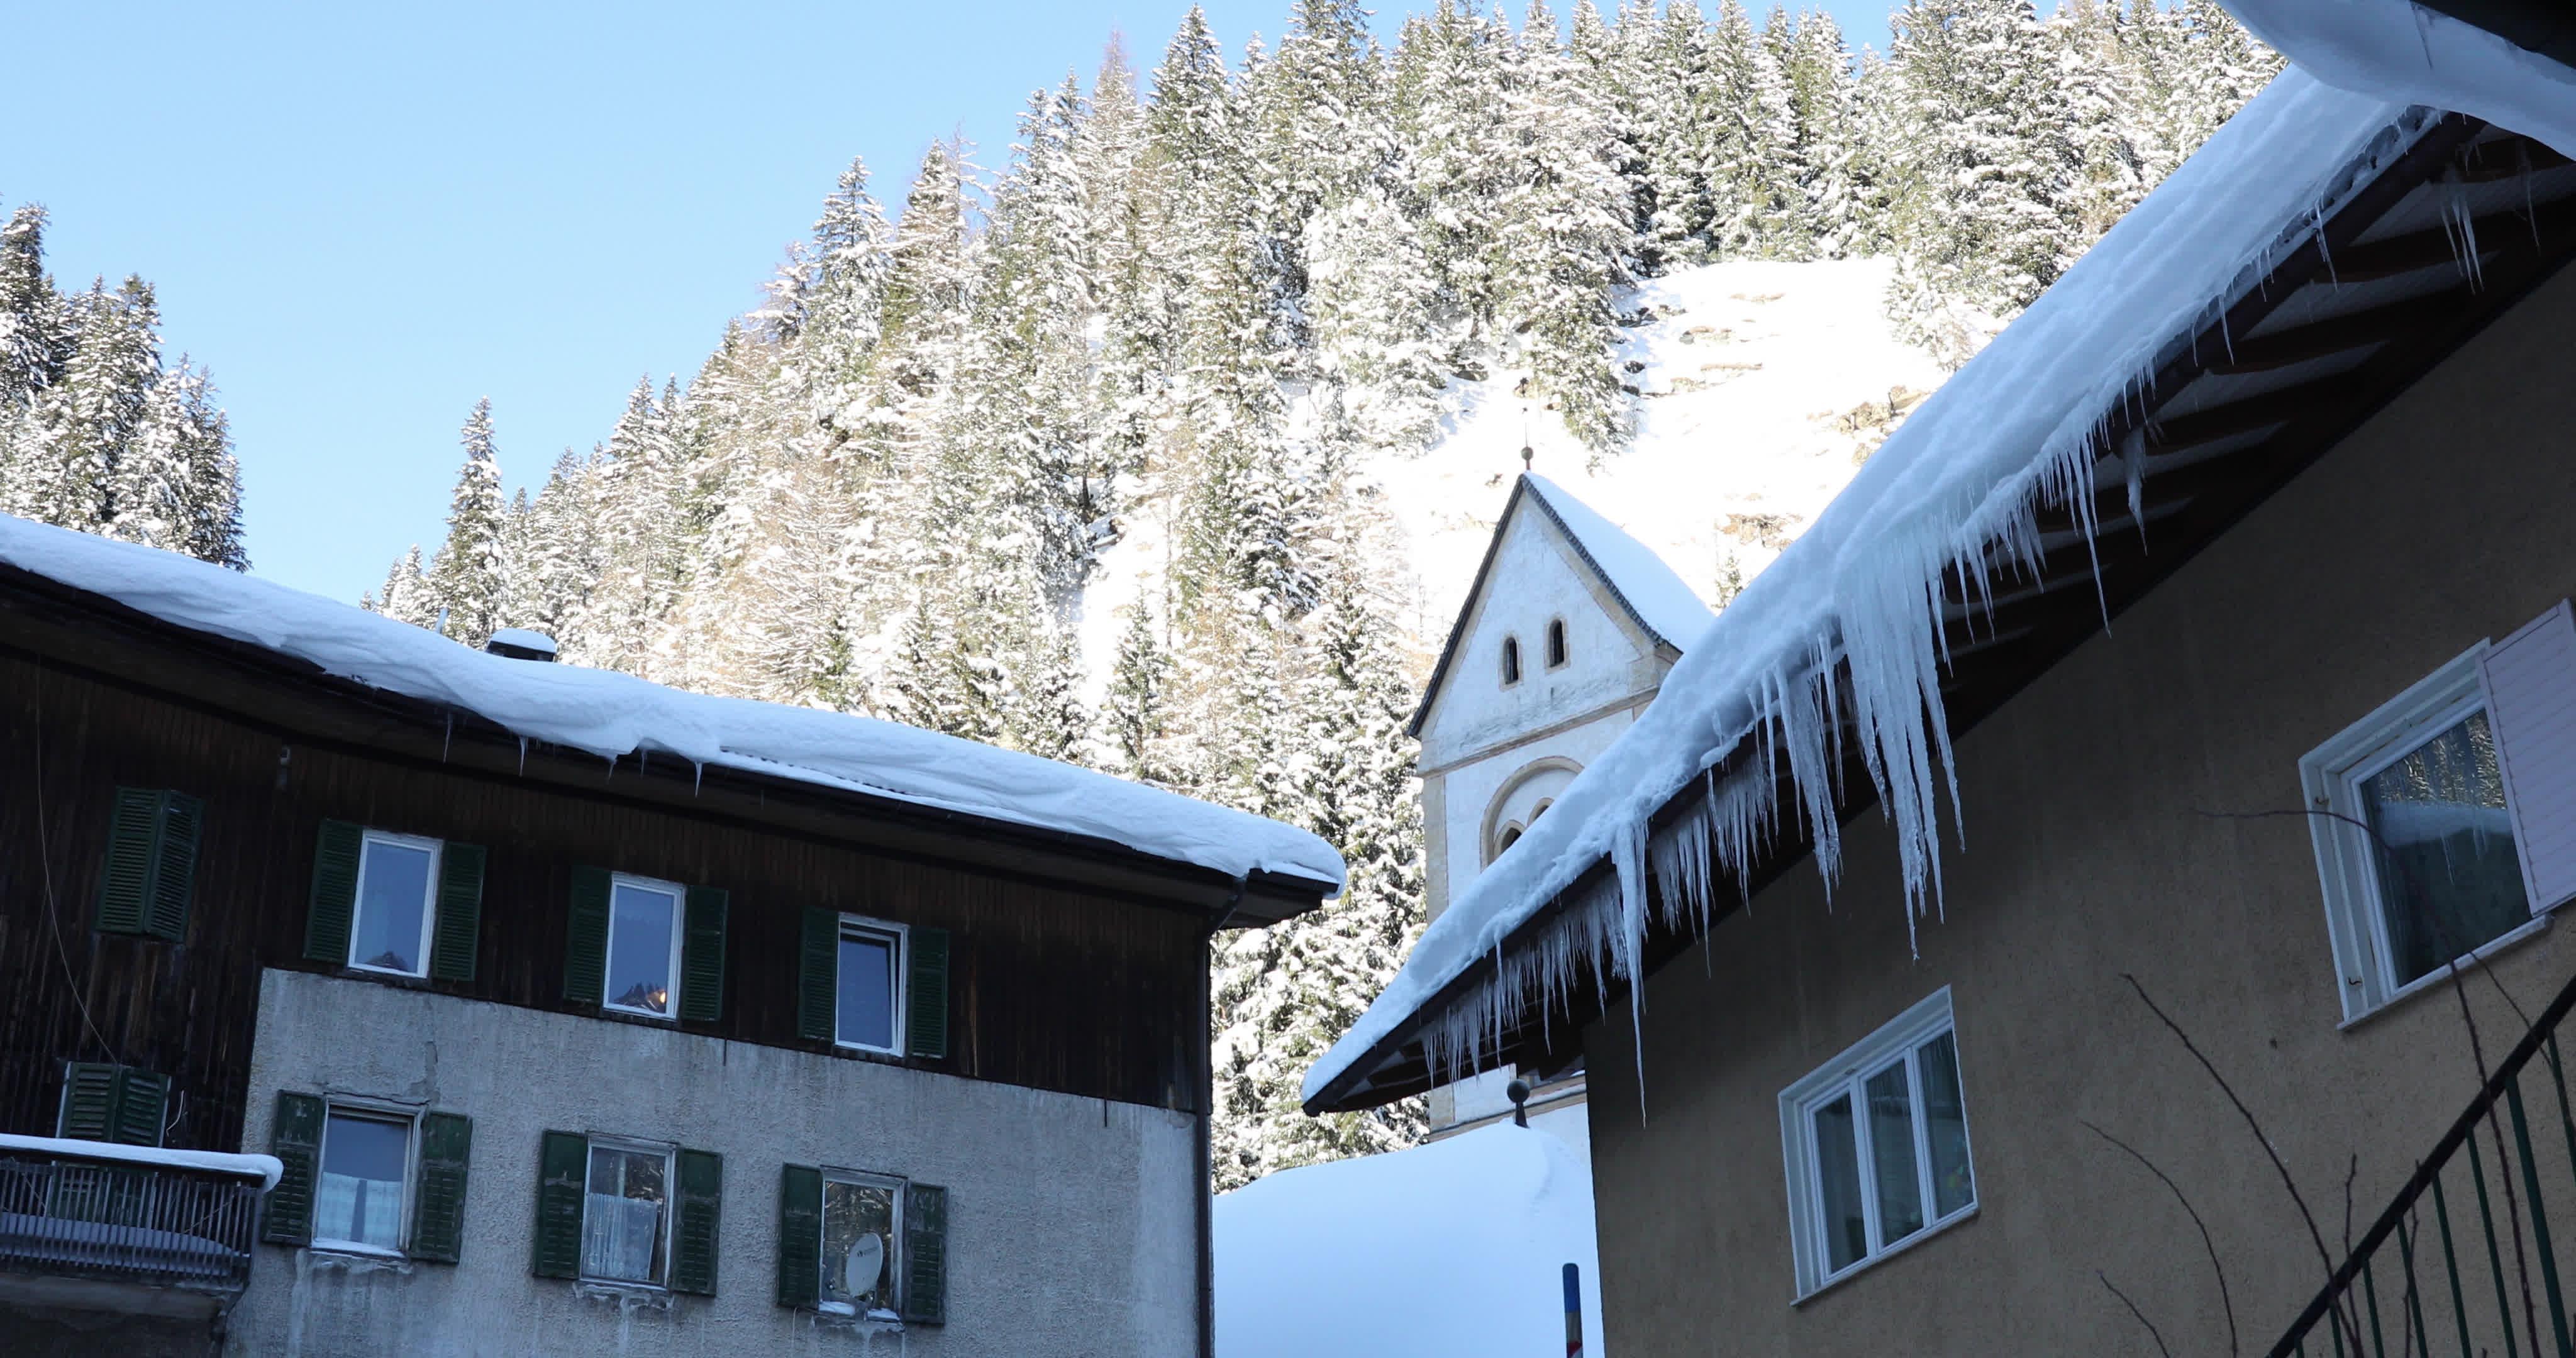 Snow In Brennero, Italy